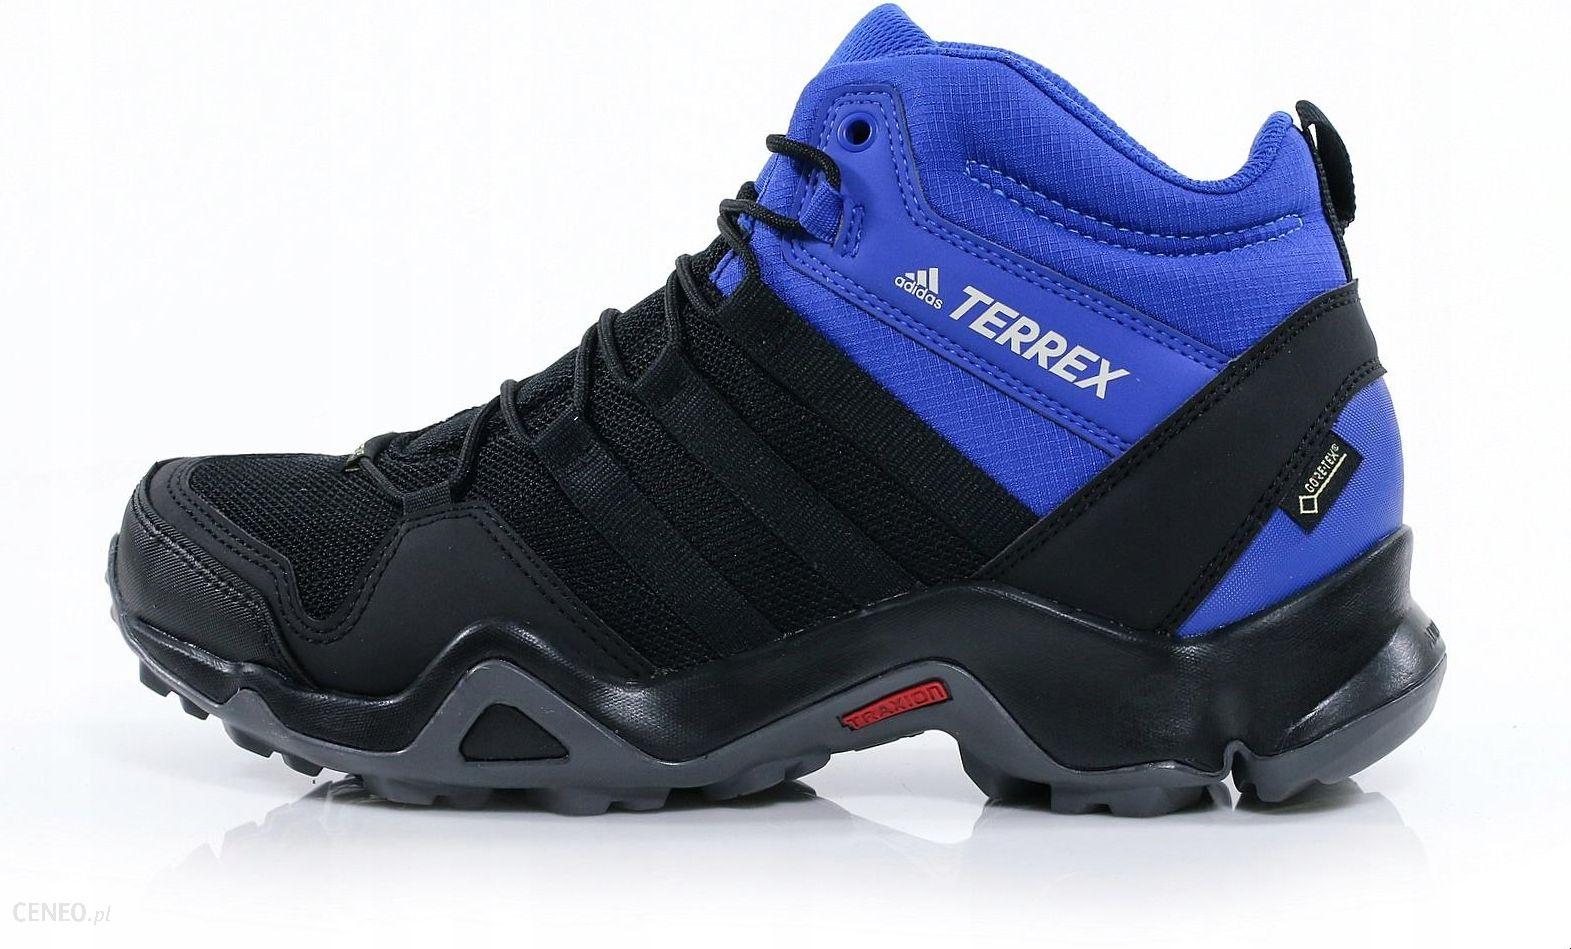 Adidas, Buty męskie, Terrex Ax2R Gtx, rozmiar 42 23